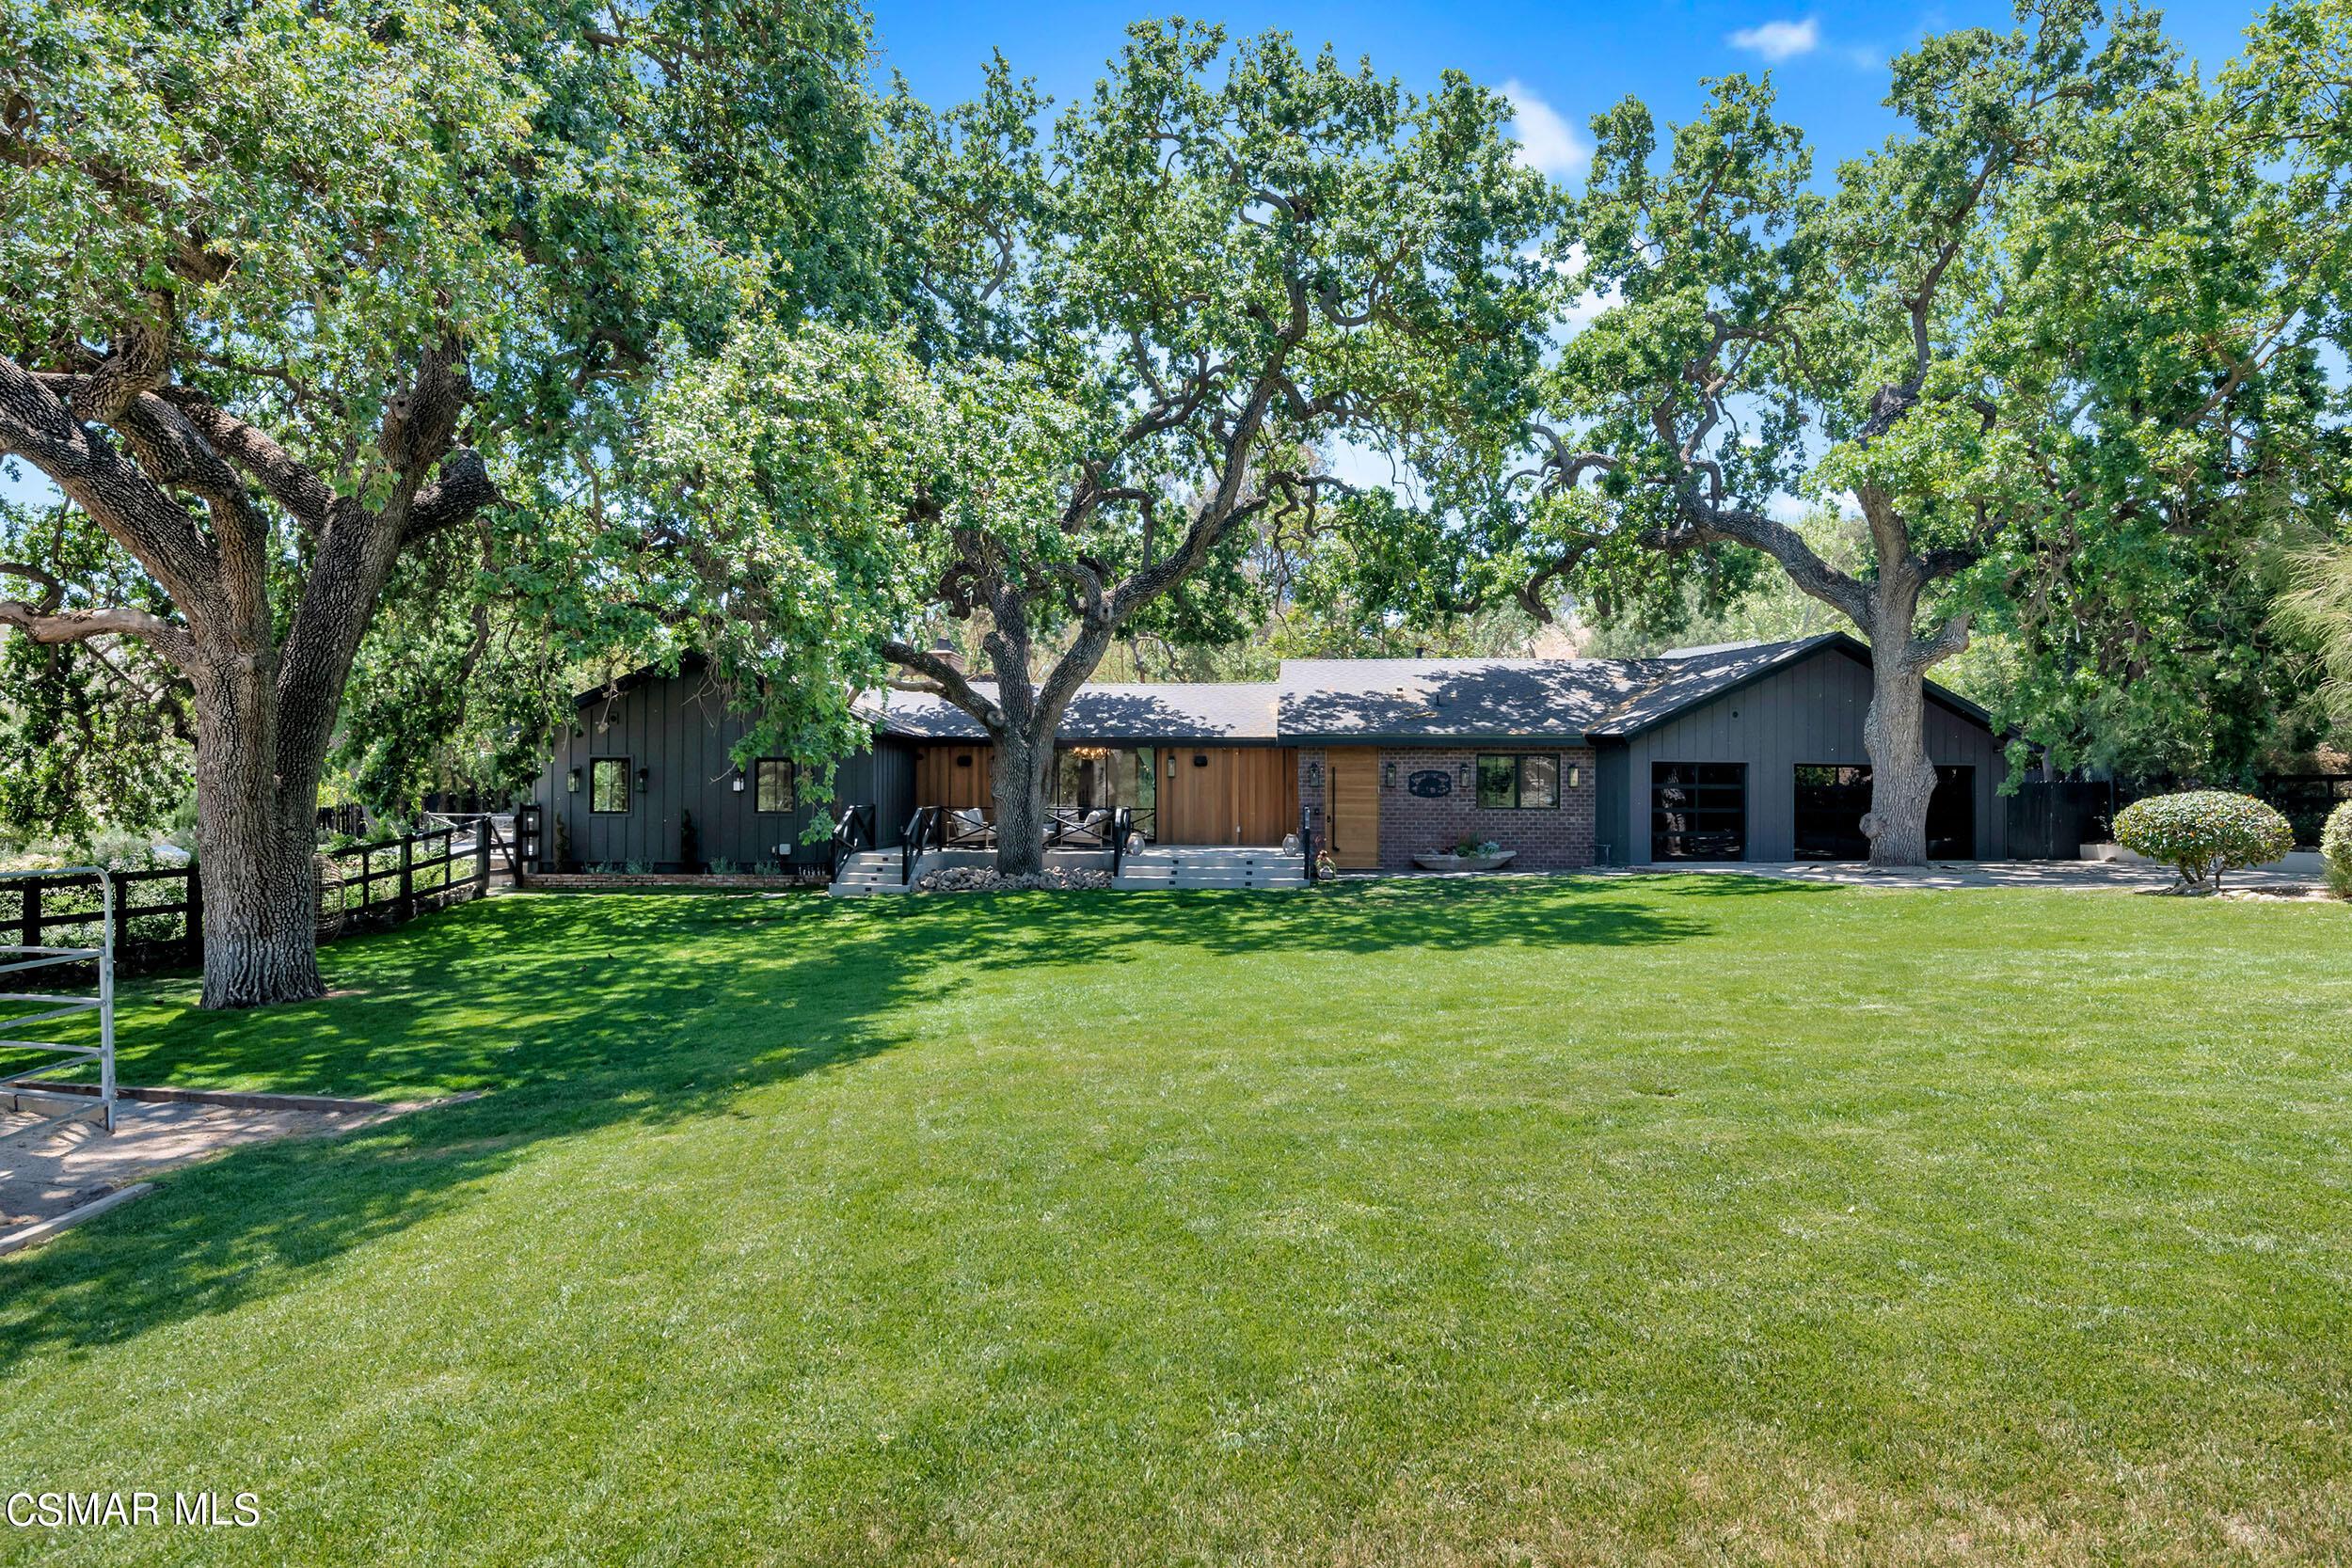 Photo of 28008 Balkins Drive, Agoura Hills, CA 91301